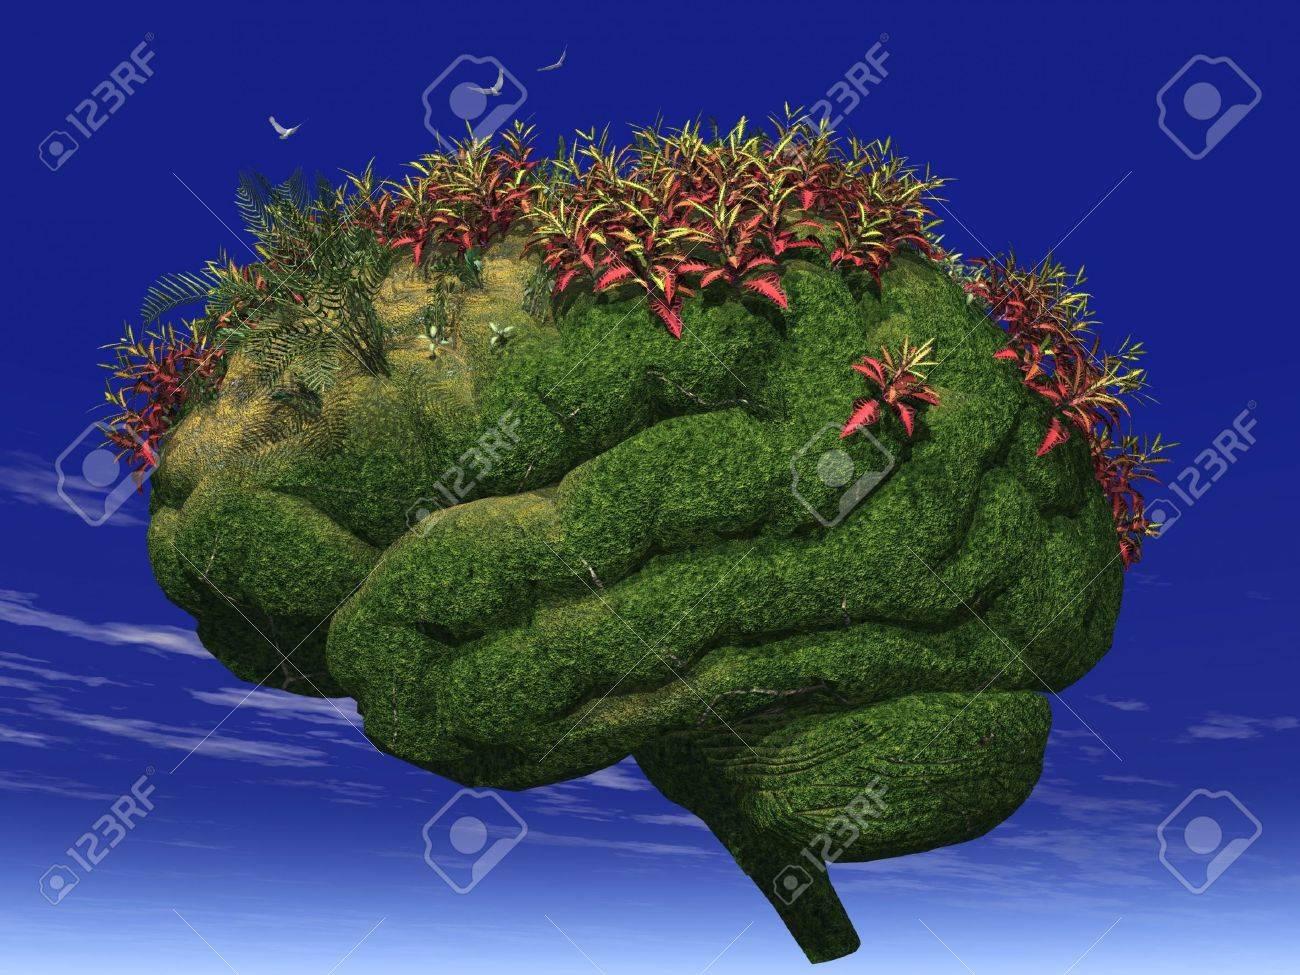 3d render of a brain-looking garden Stock Photo - 629444